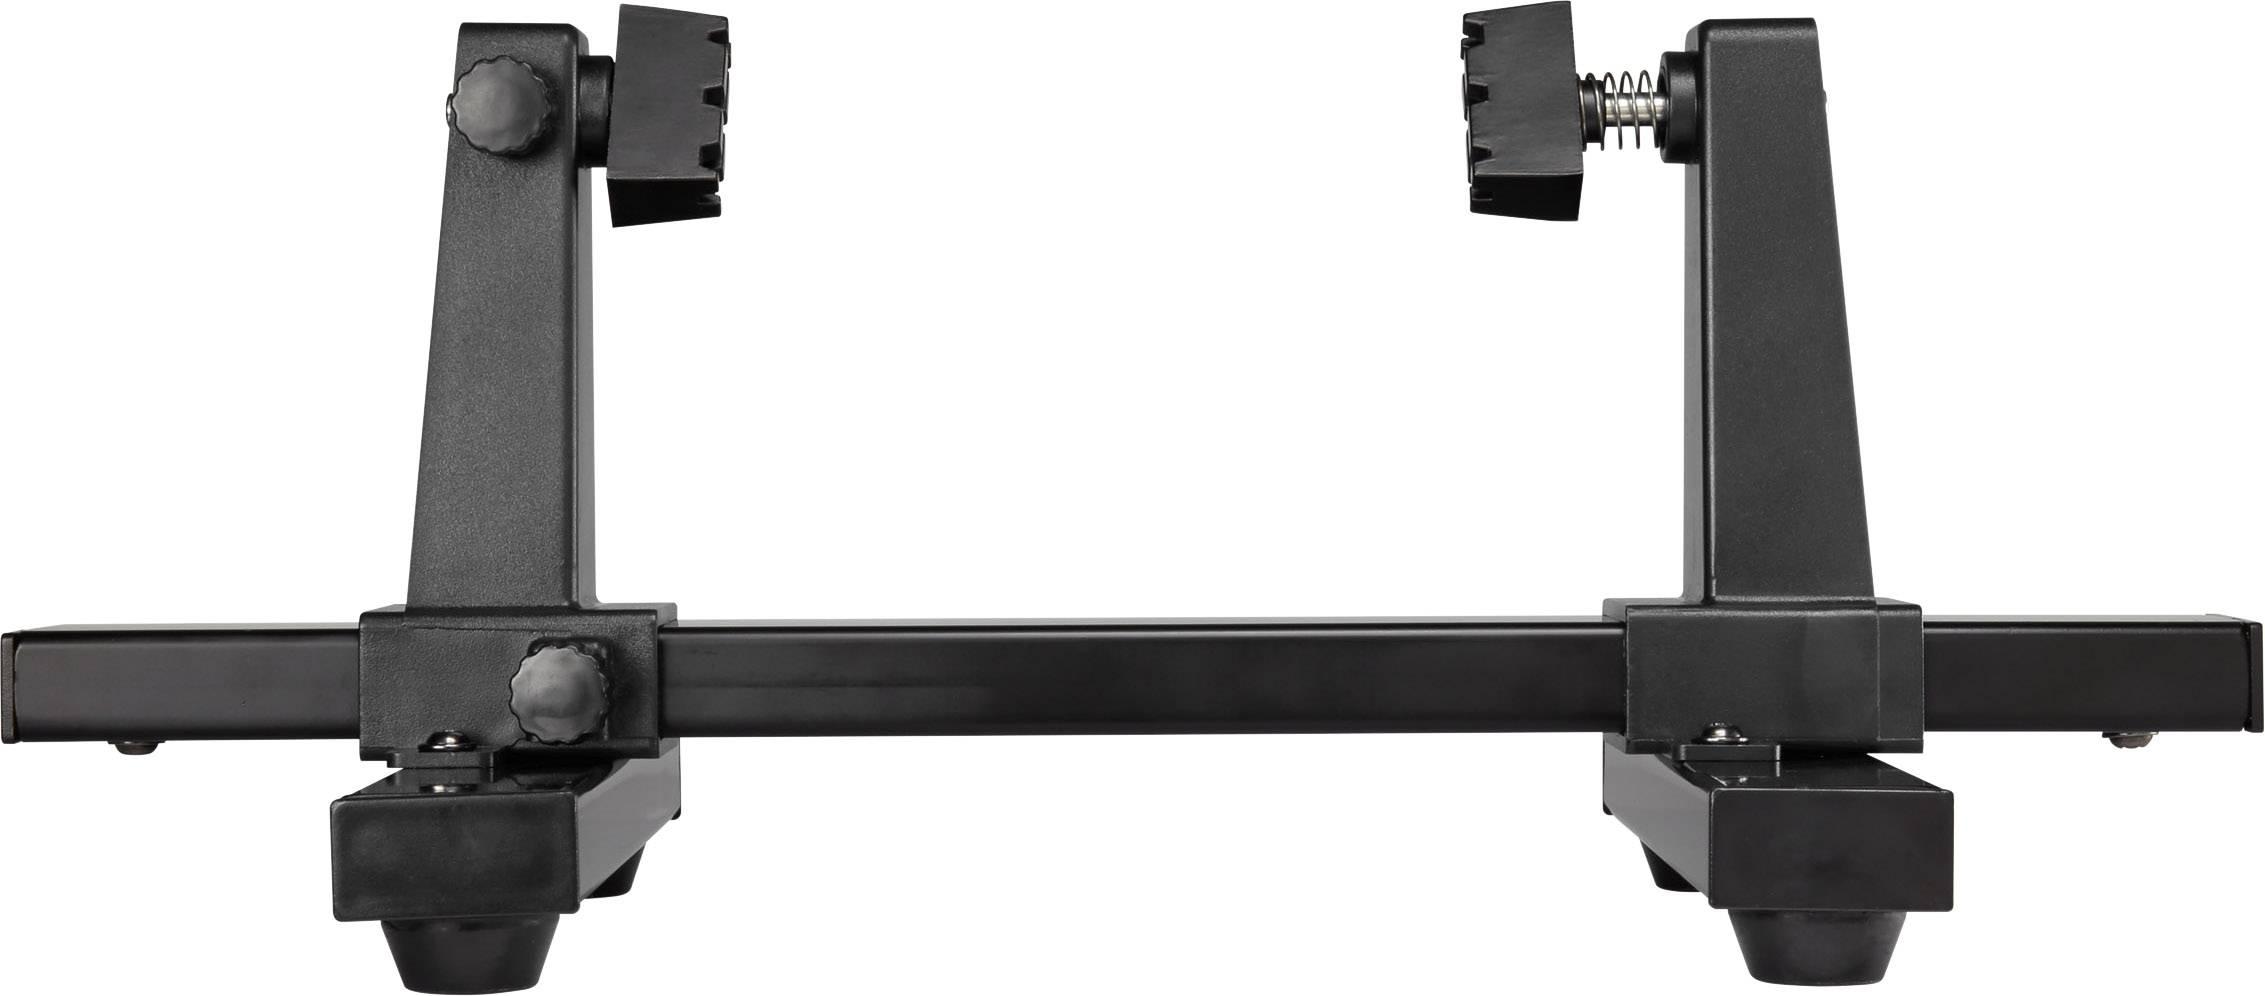 Držiak na DPS TOOLCRAFT 1372161, (d x š x v) 165 x 330 x 125 mm, 1 ks